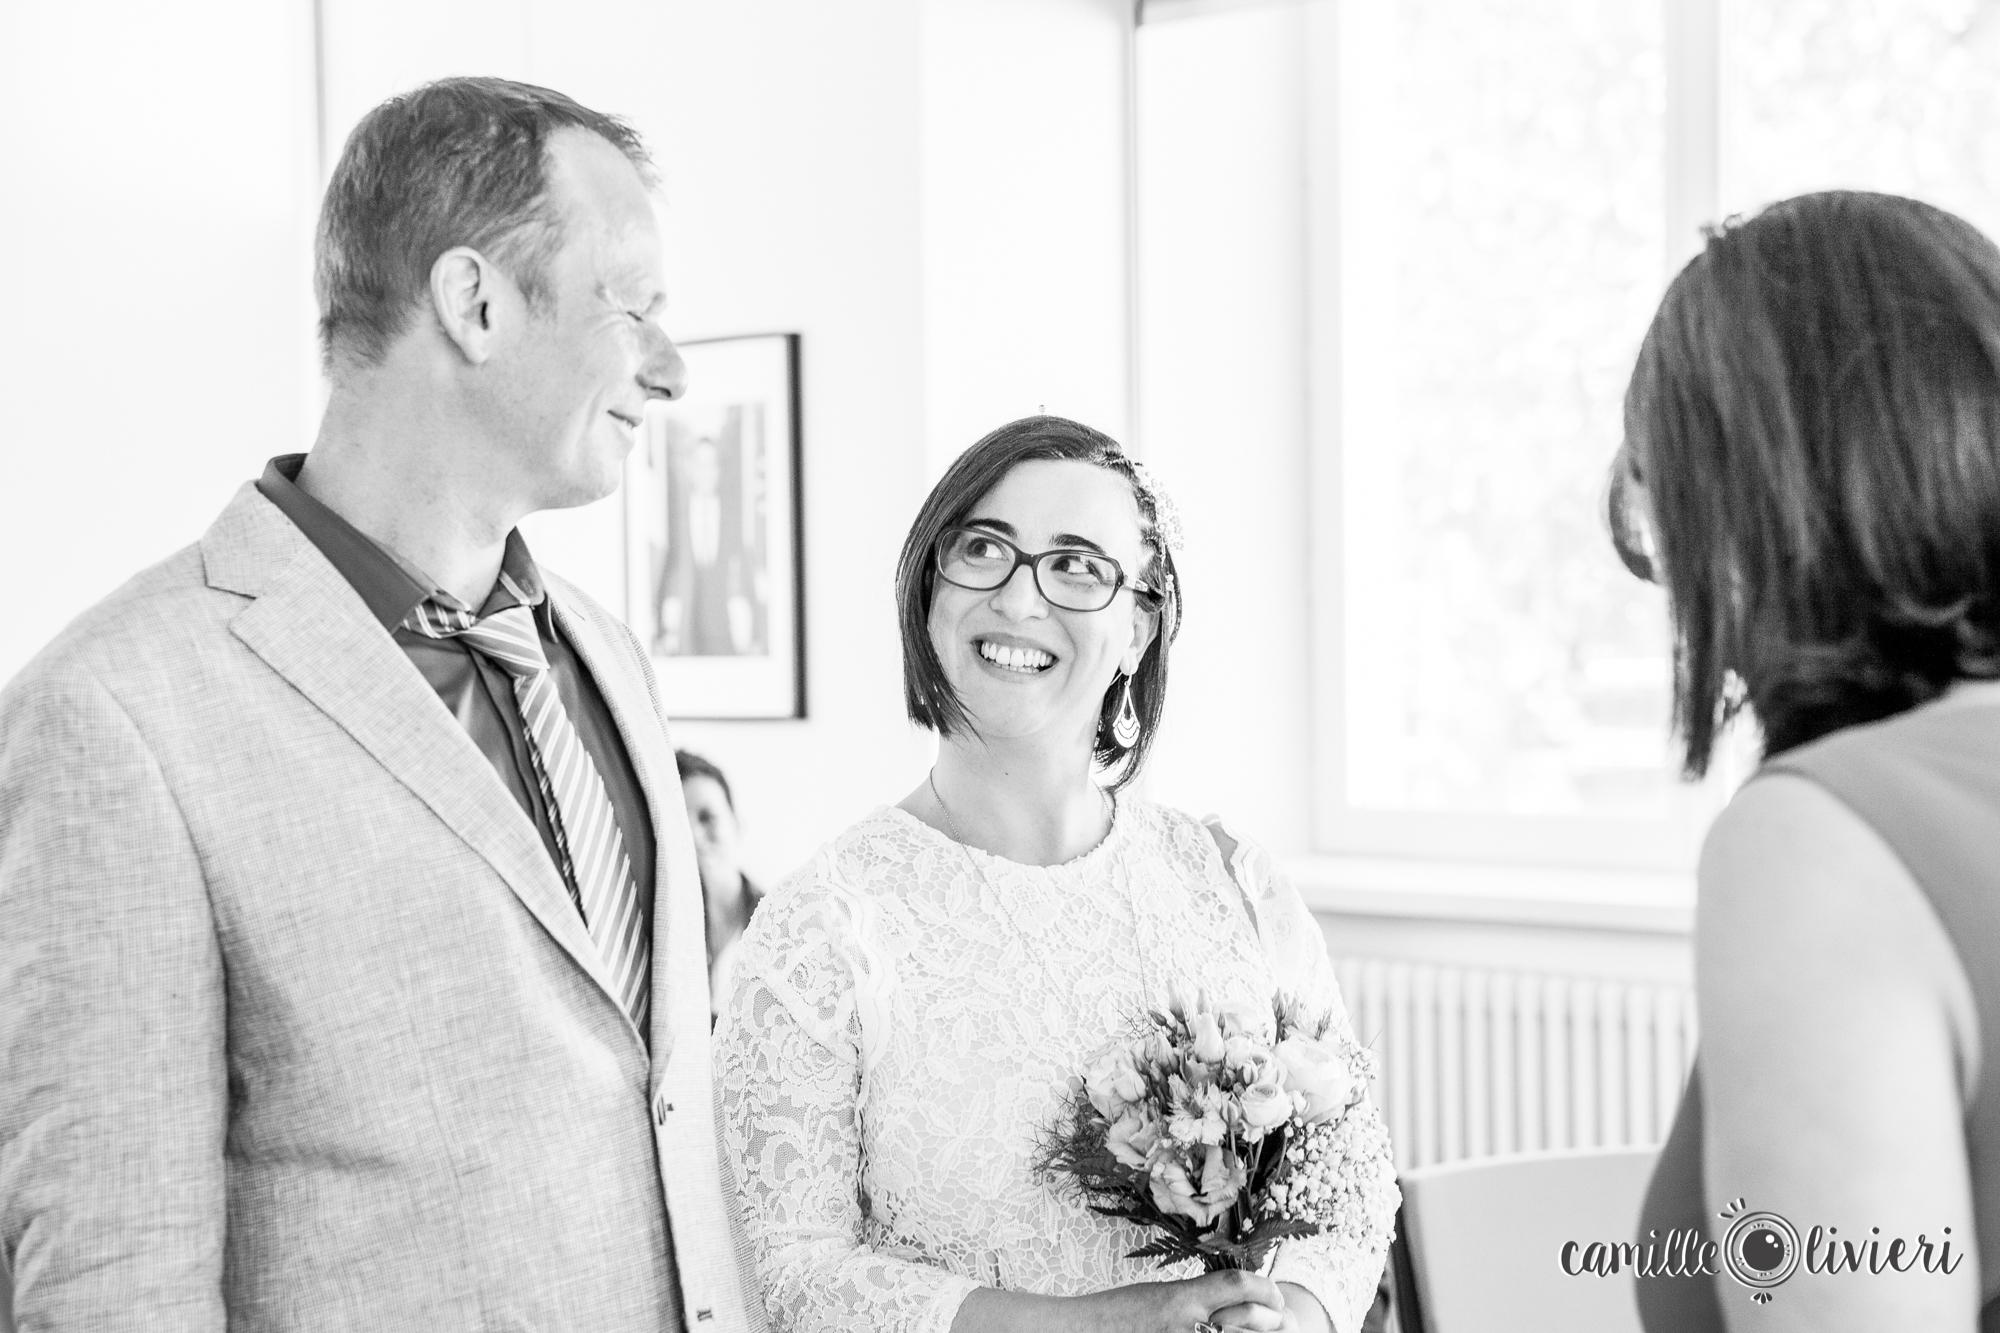 photographe_grenoble_mariage-camille-olivieri-47